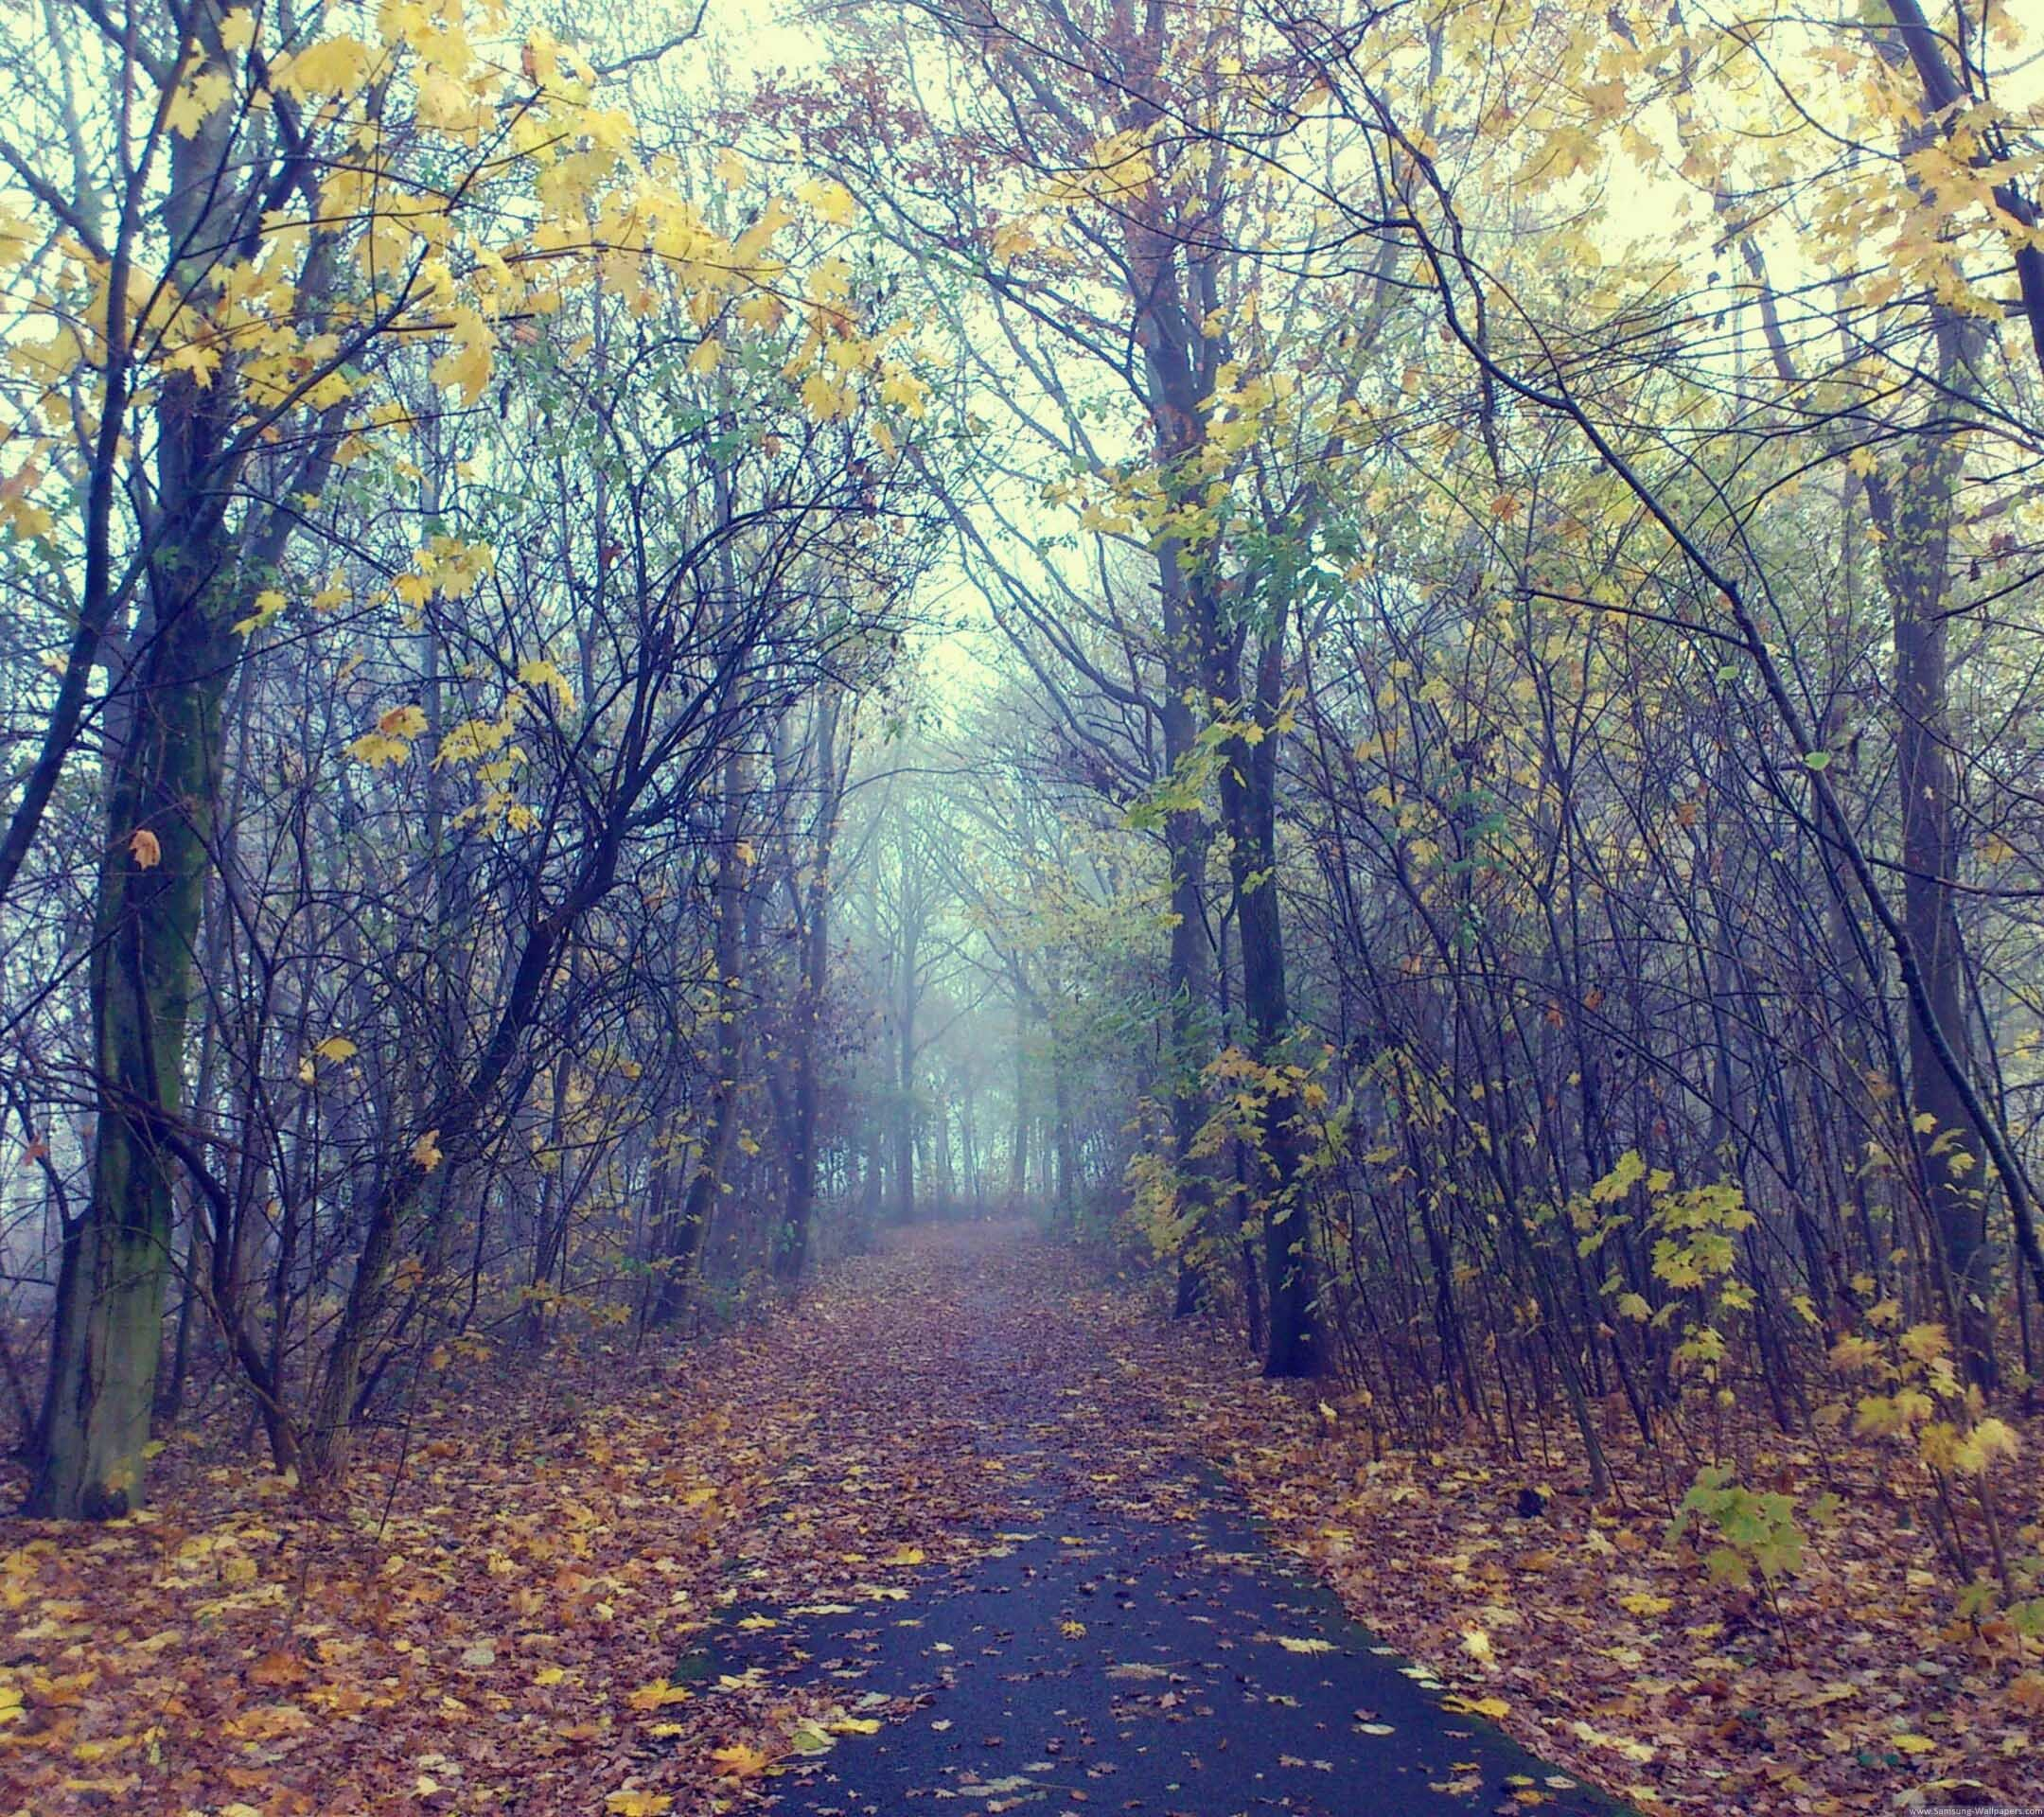 autumn screen wallpaper 64 images